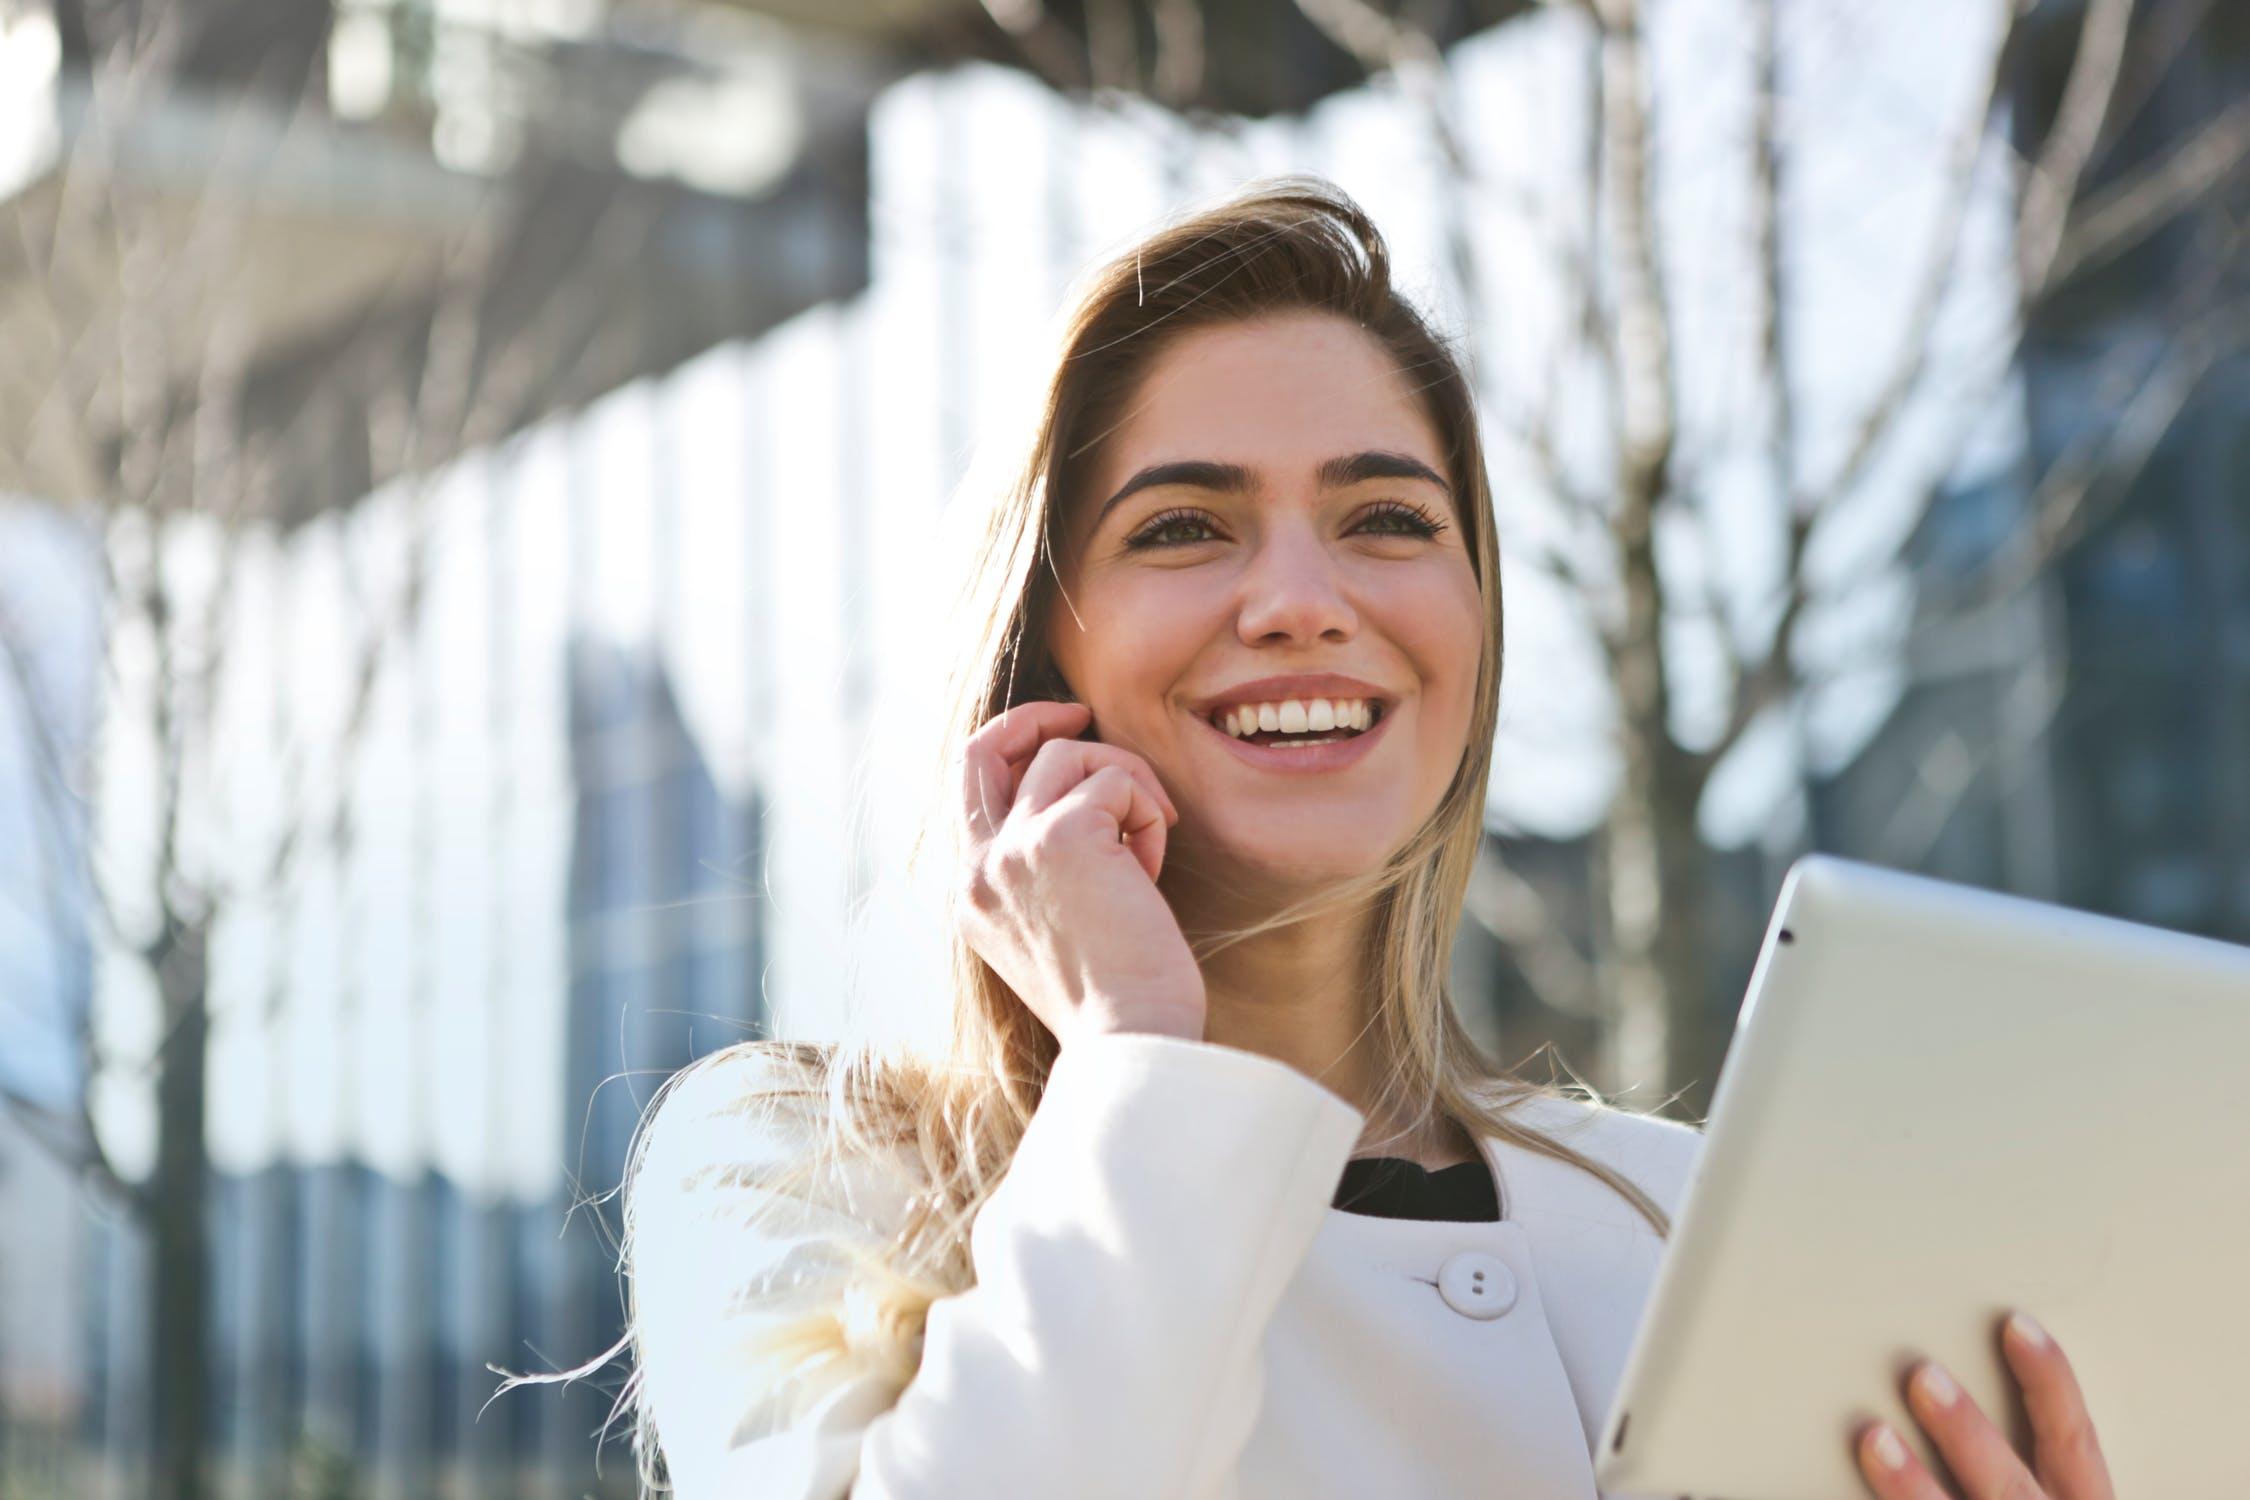 Smiling woman using ipad